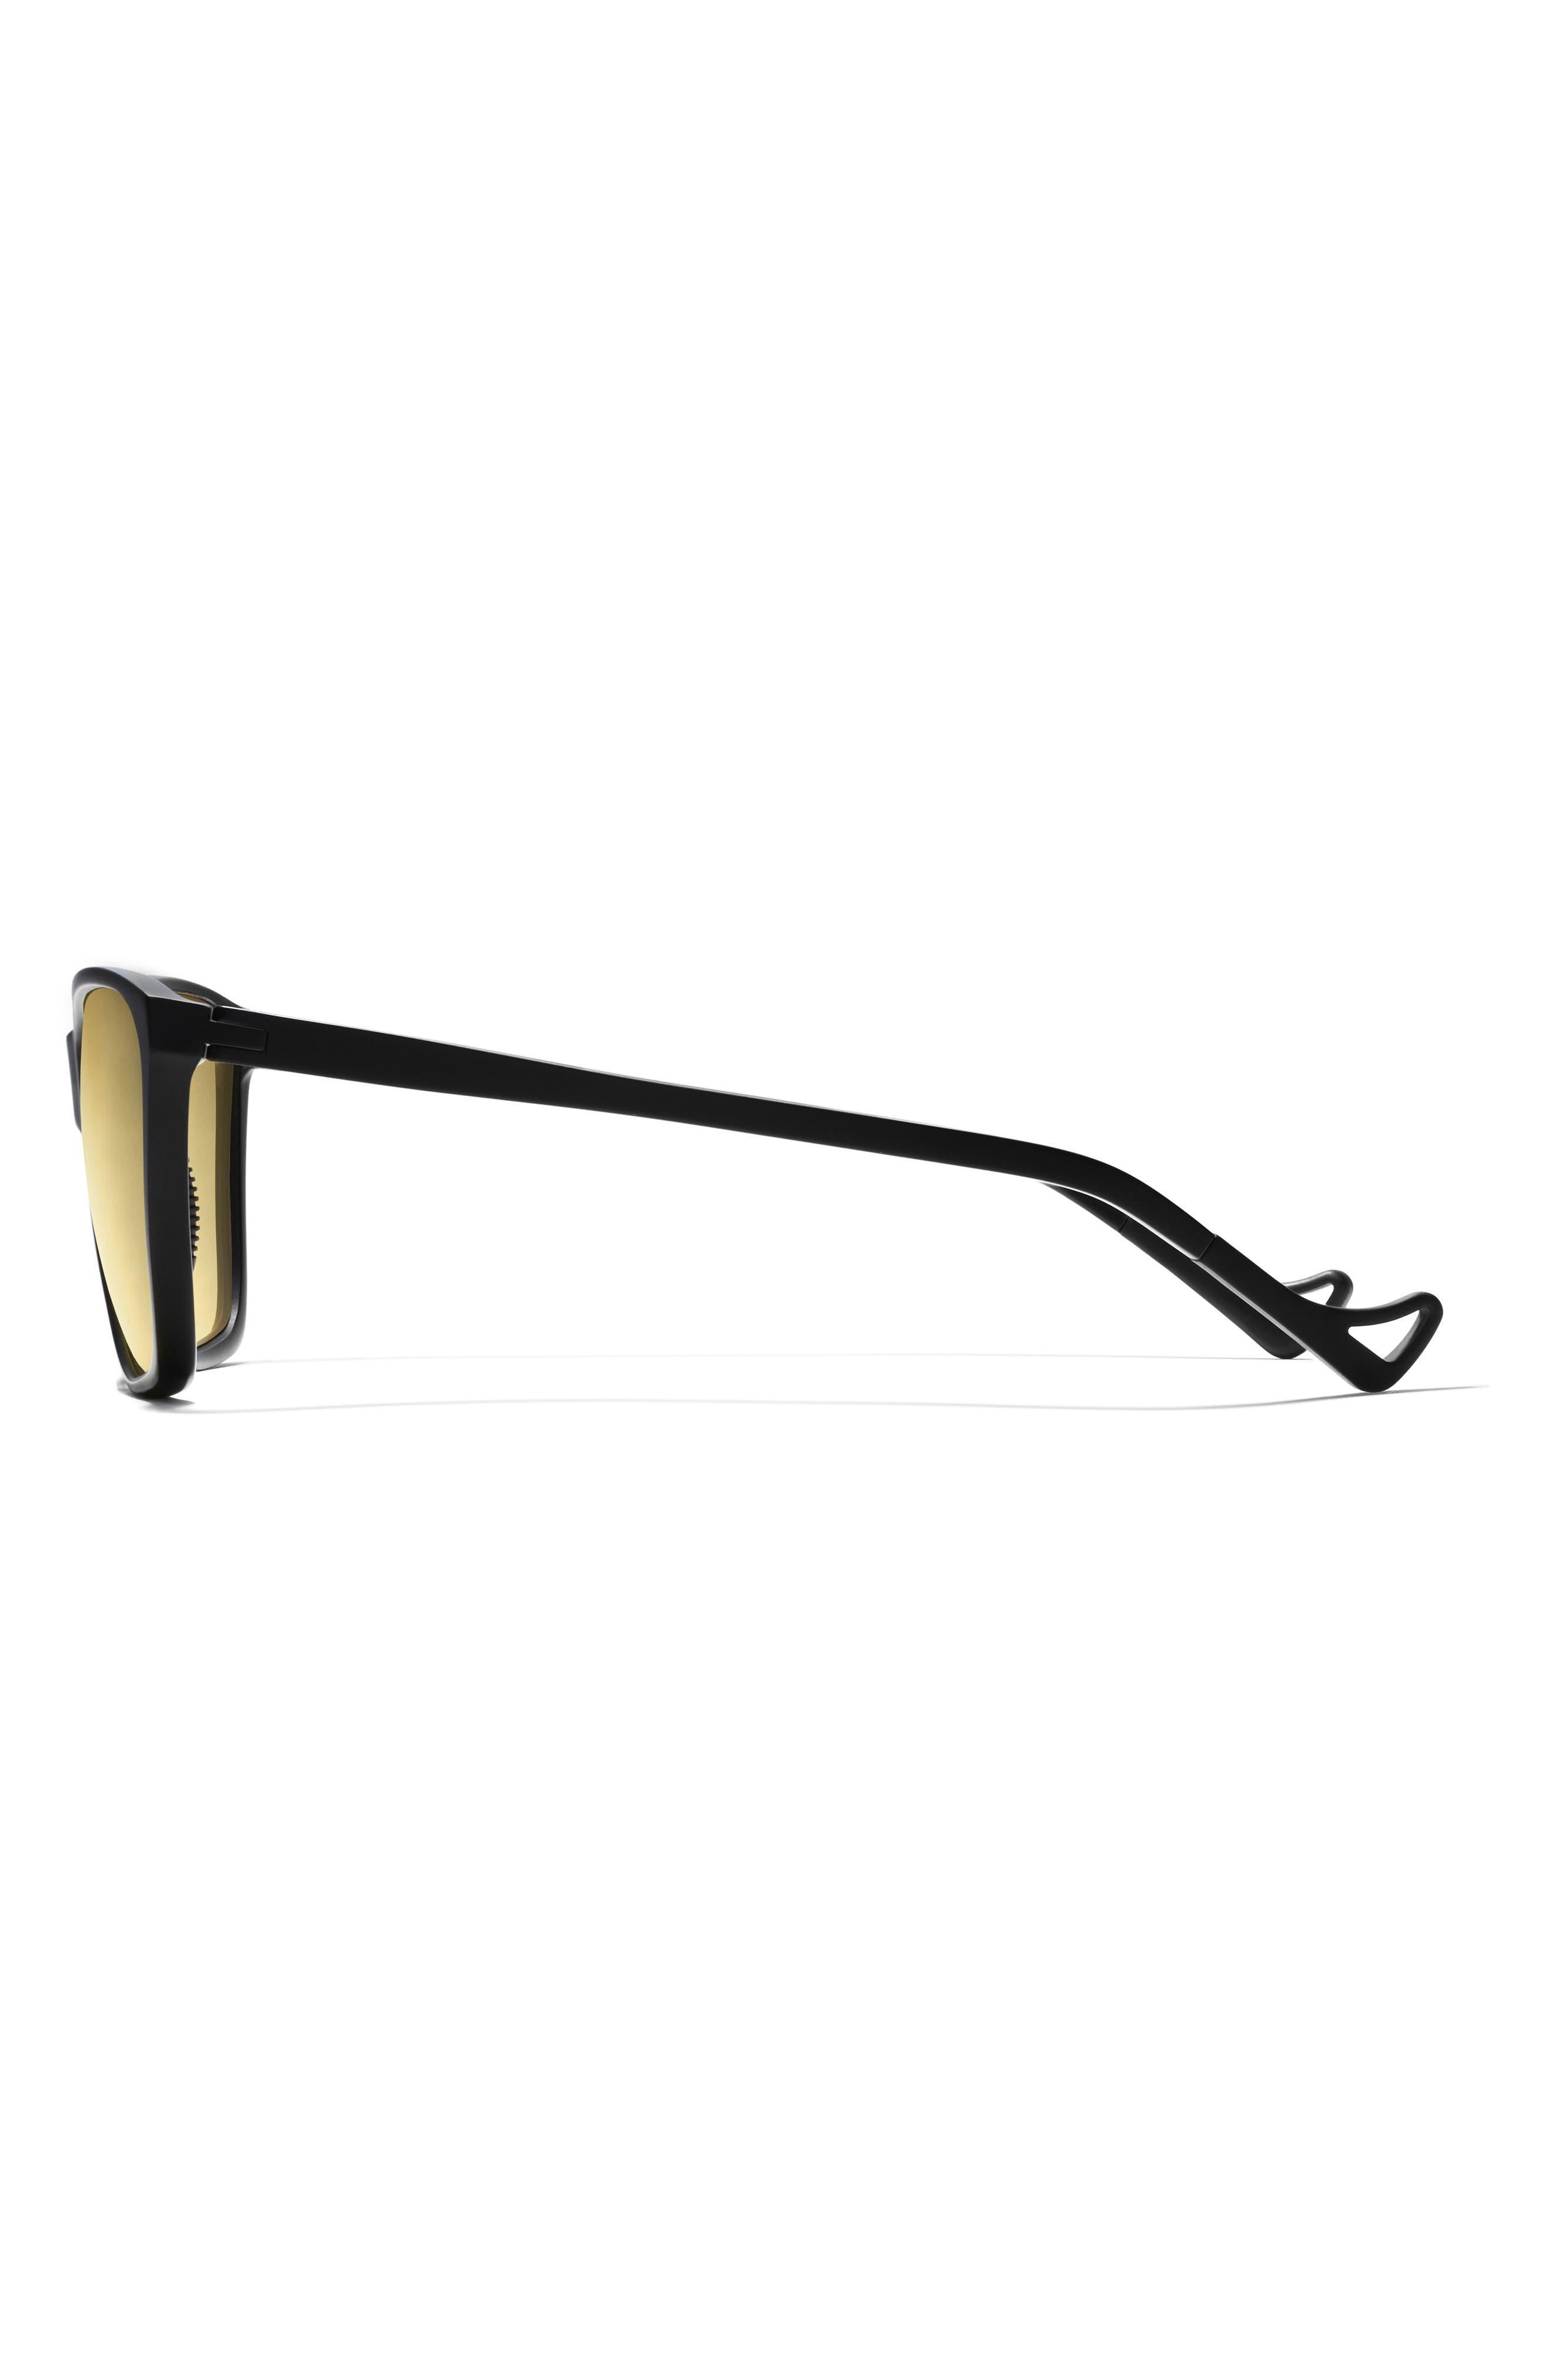 Keiichi Standard 55mm Sunglasses,                             Main thumbnail 1, color,                             BLACK/ YELLOW